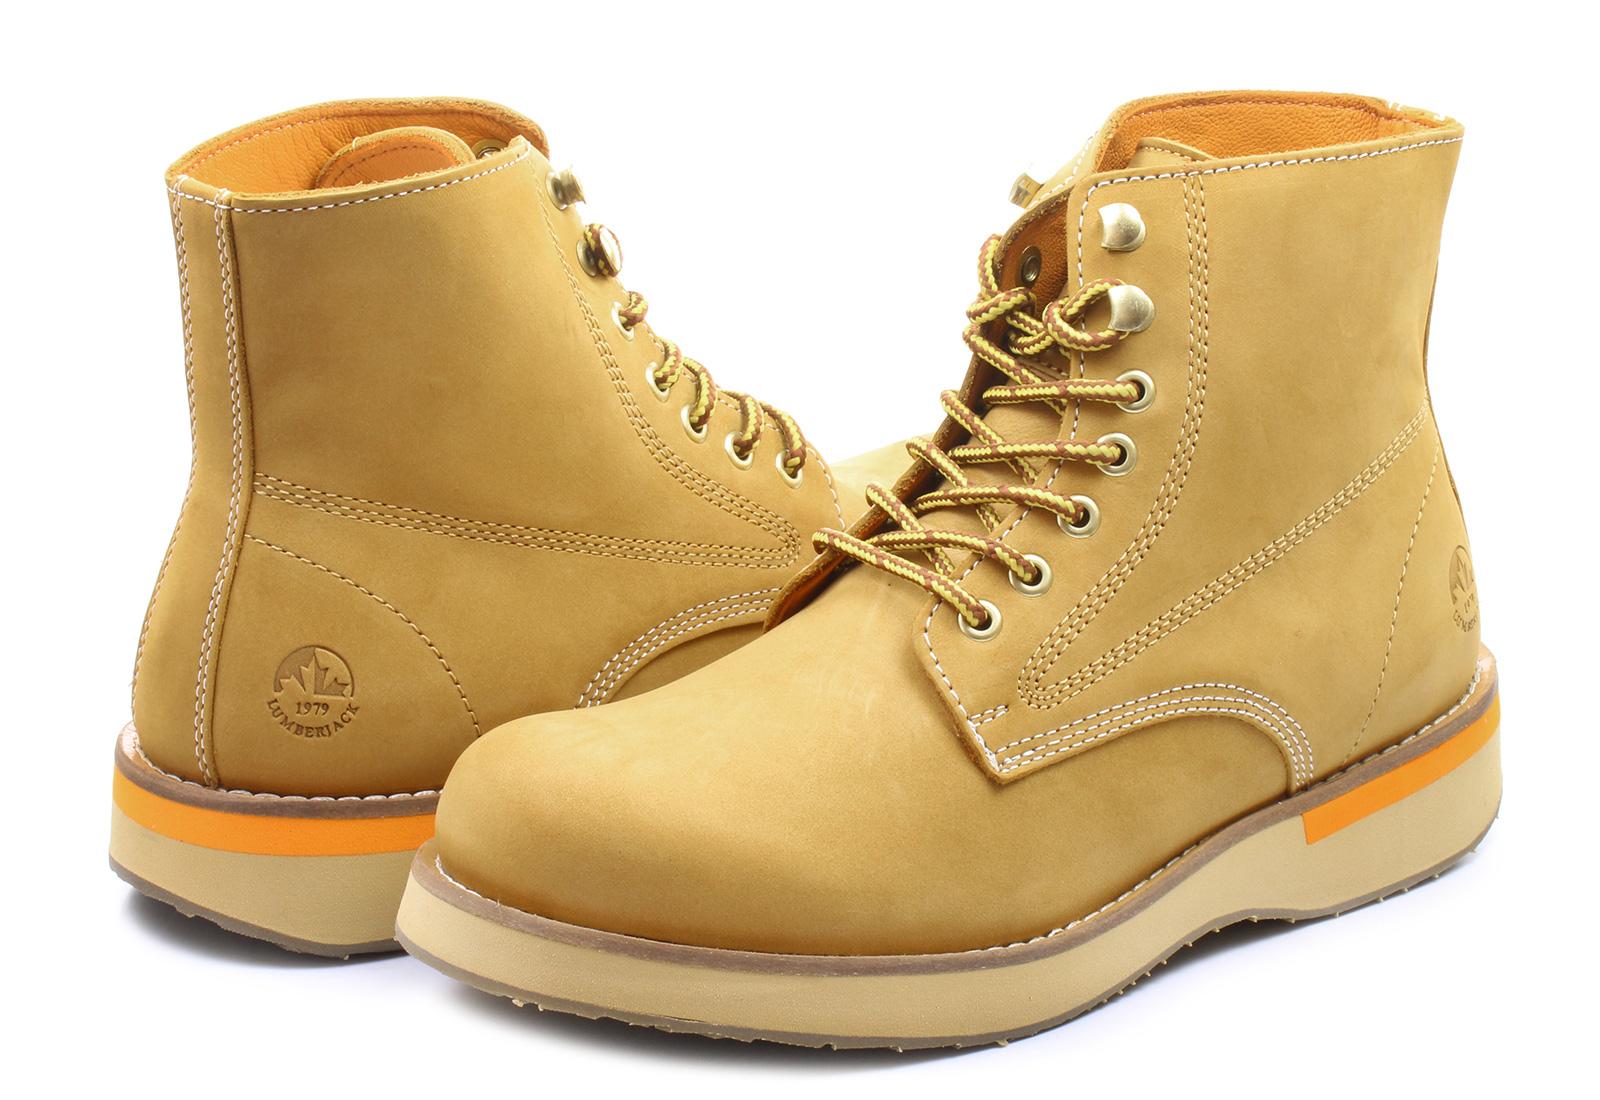 Frye Boots Black Wayde Lace Up Men S